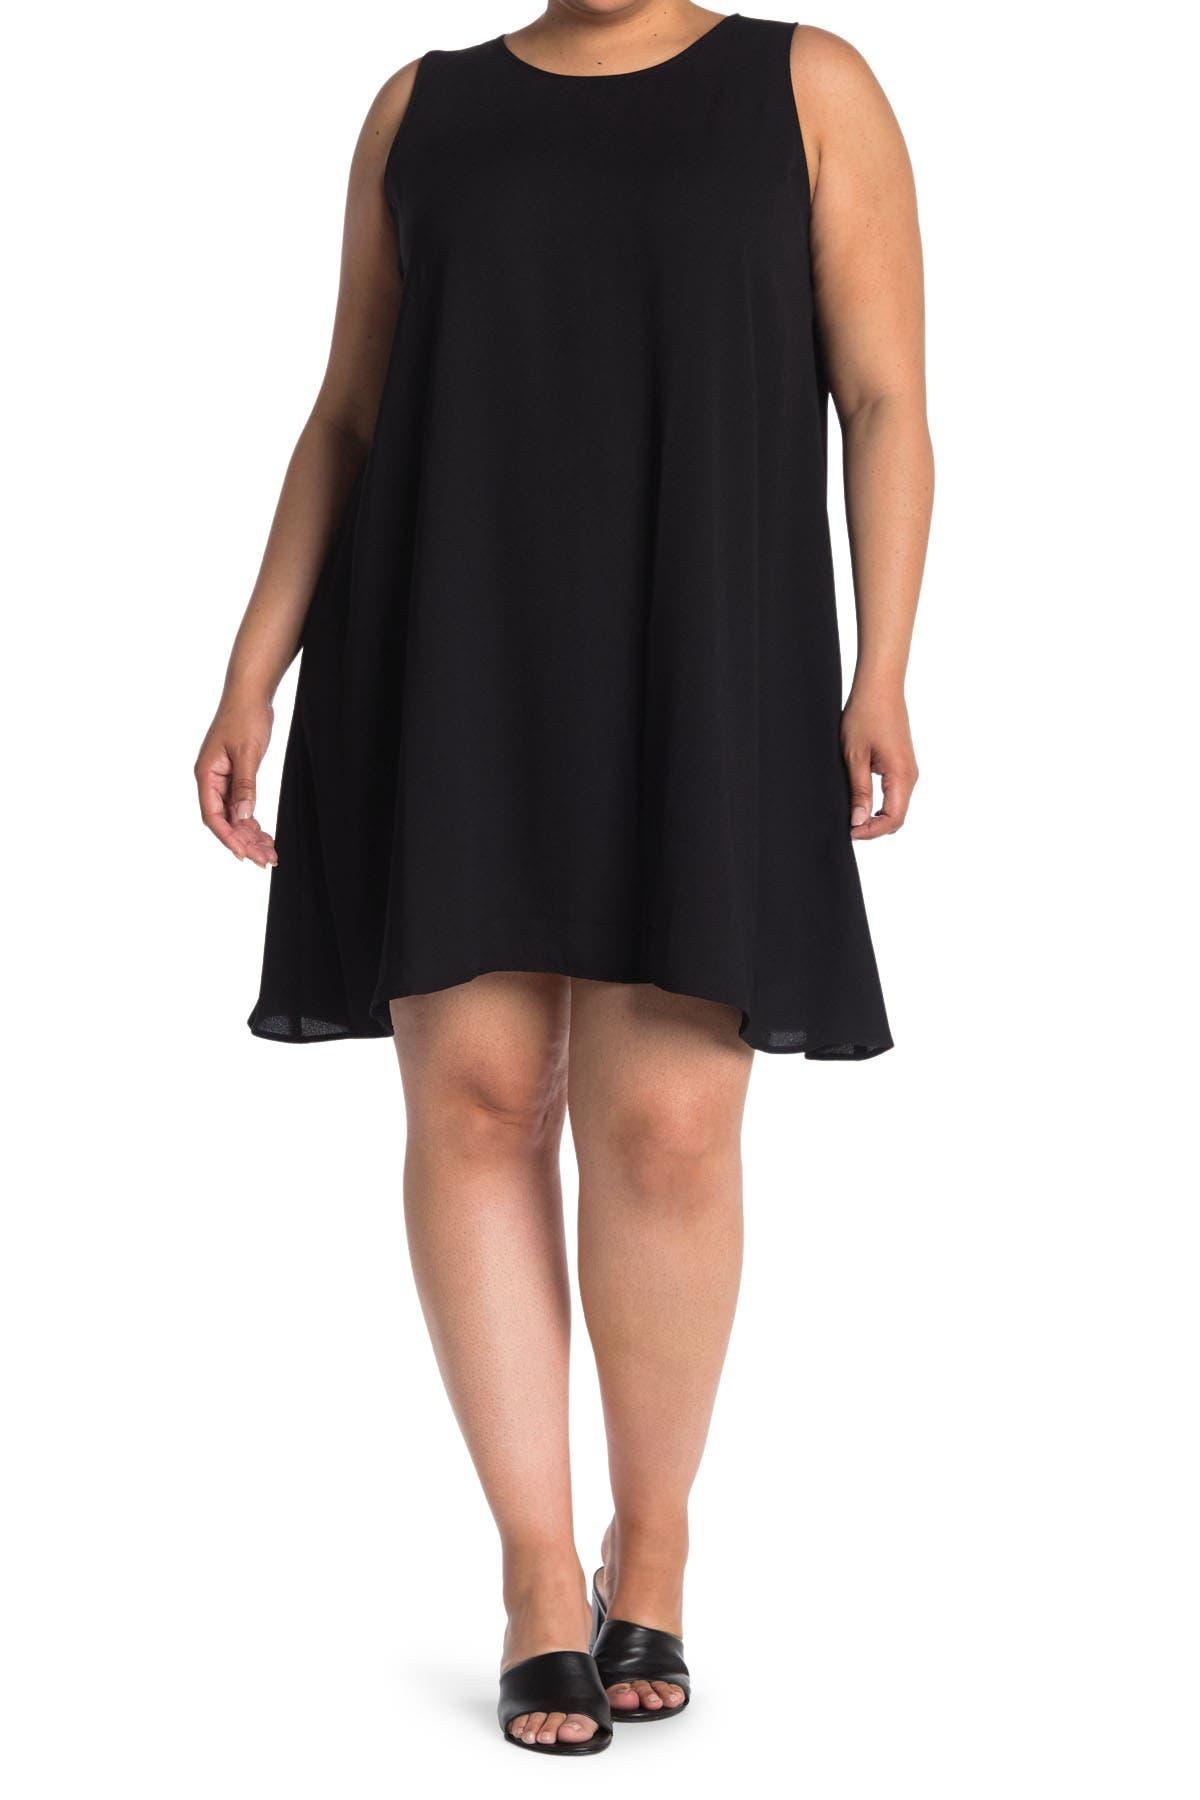 Image of Halogen Sleeveless A-Line Dress